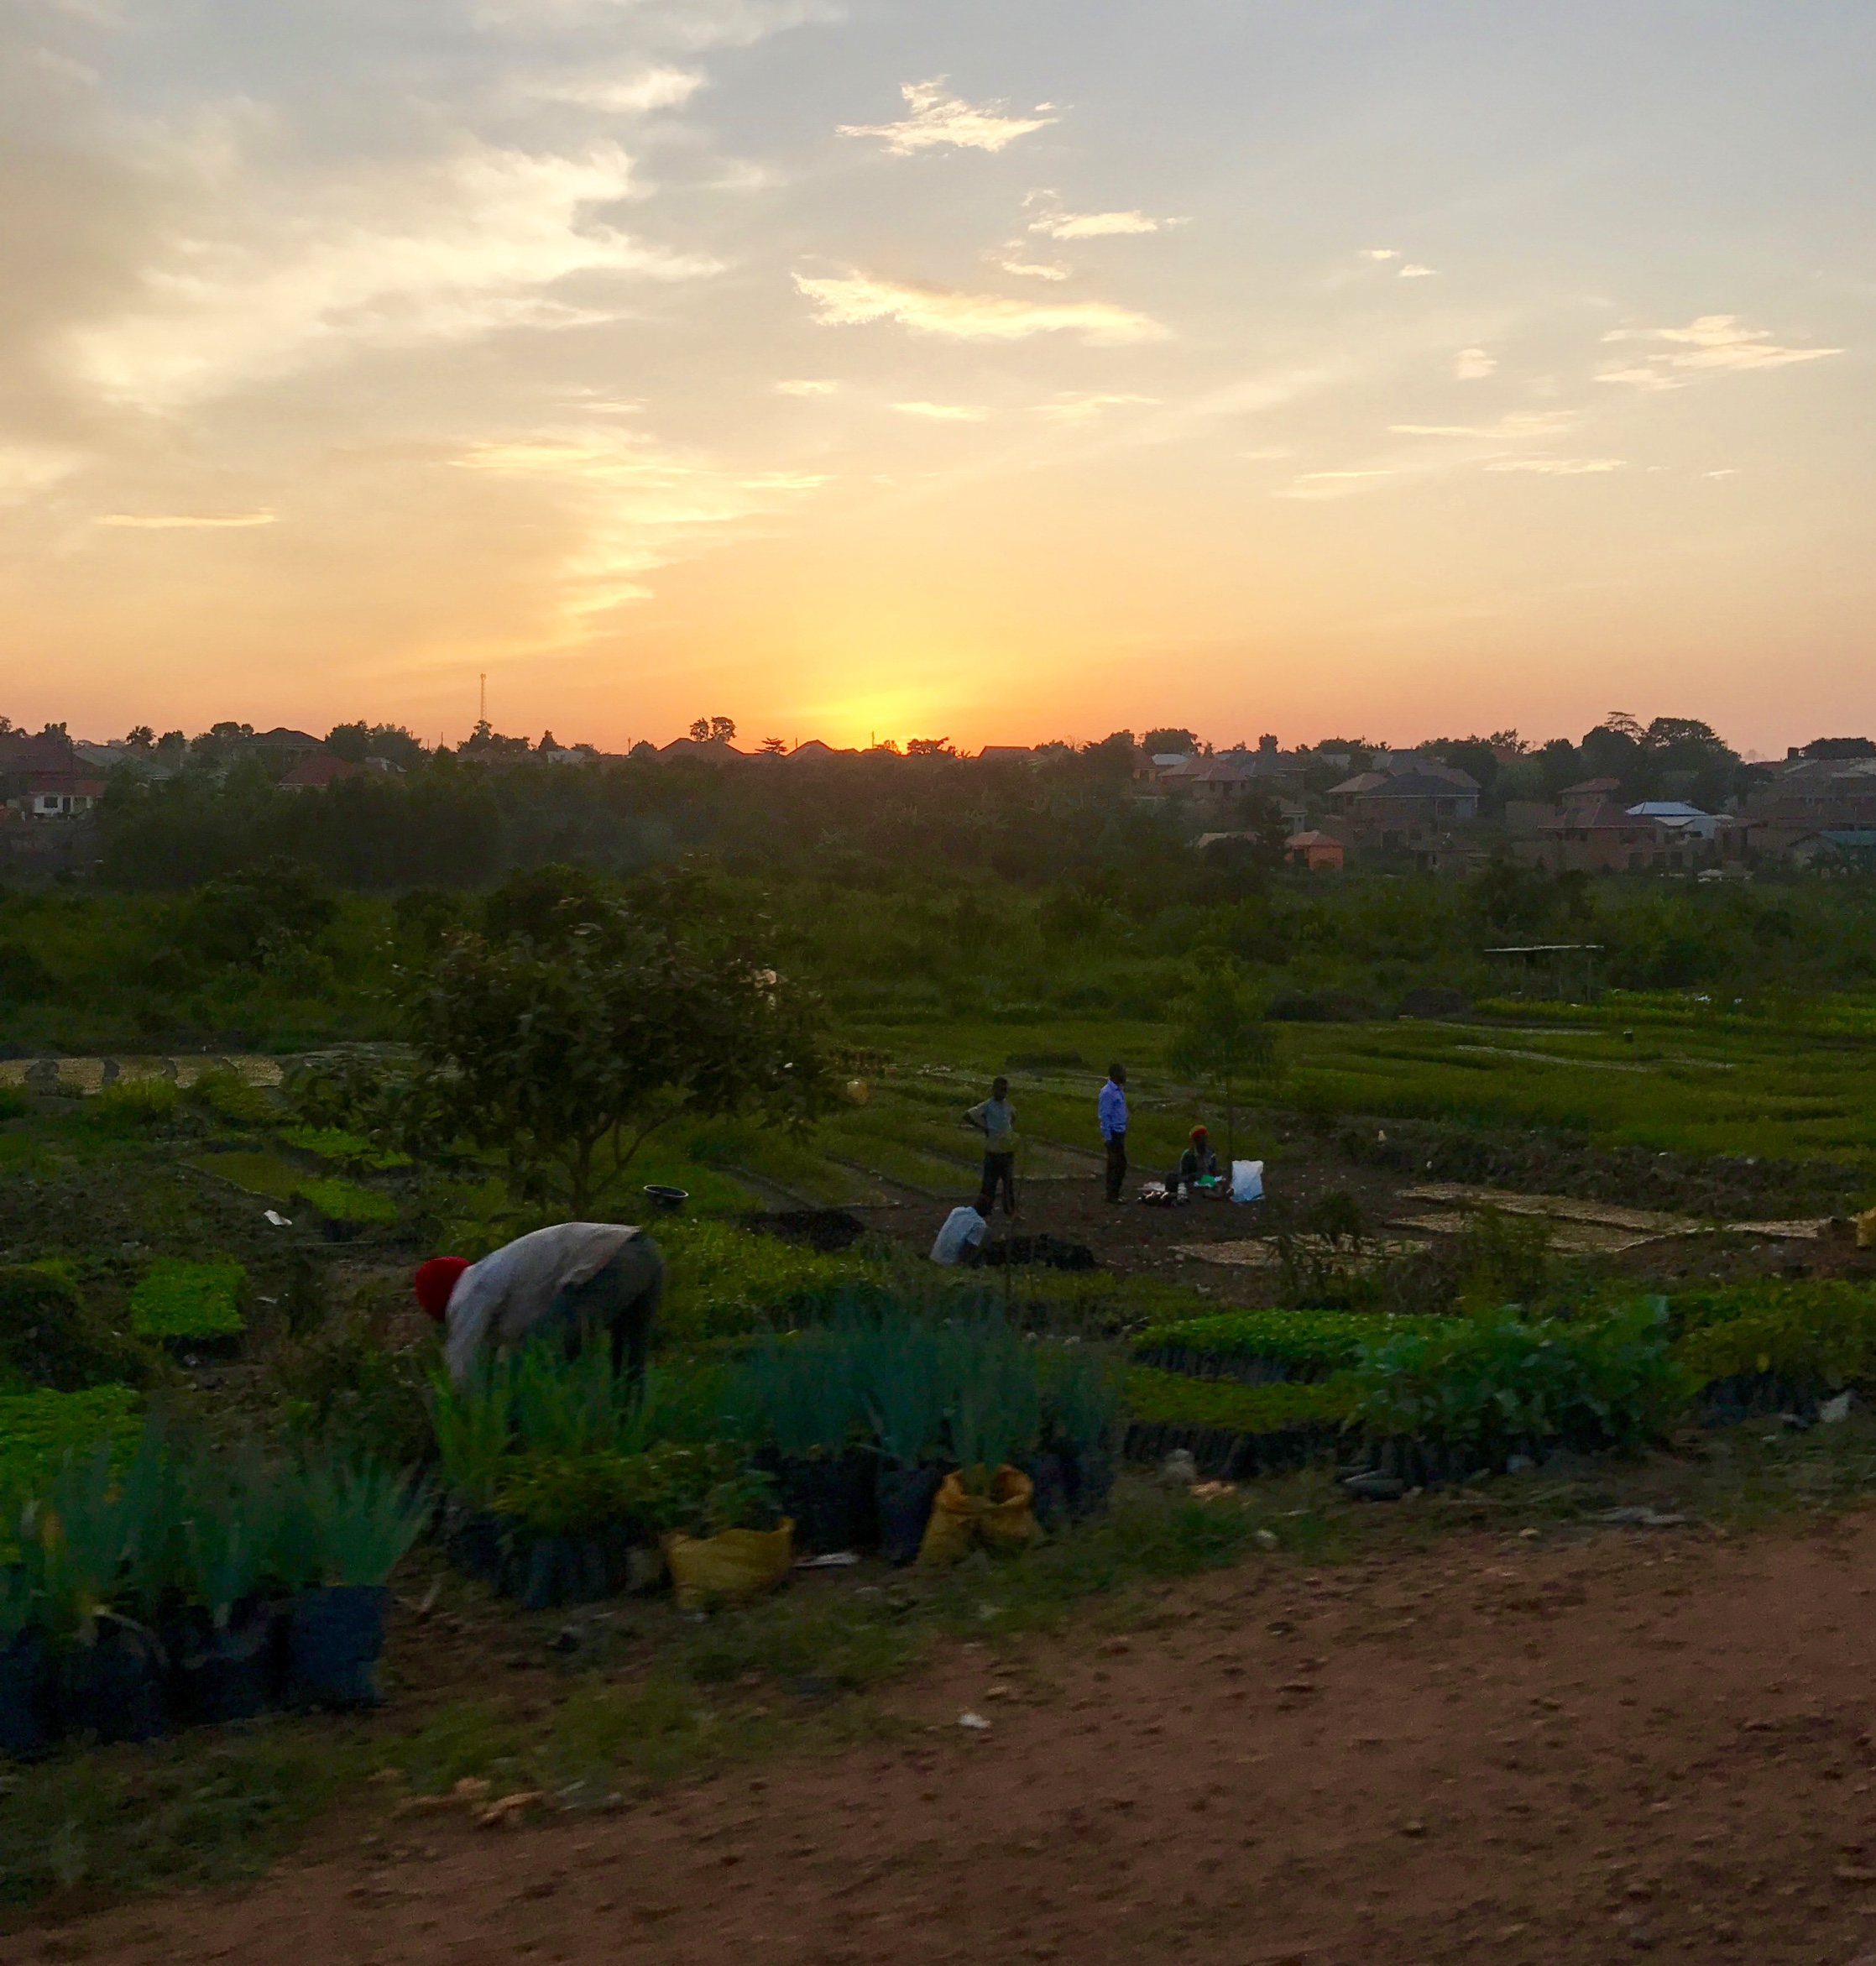 Sunset in Uganda - Photo by Carter Martens